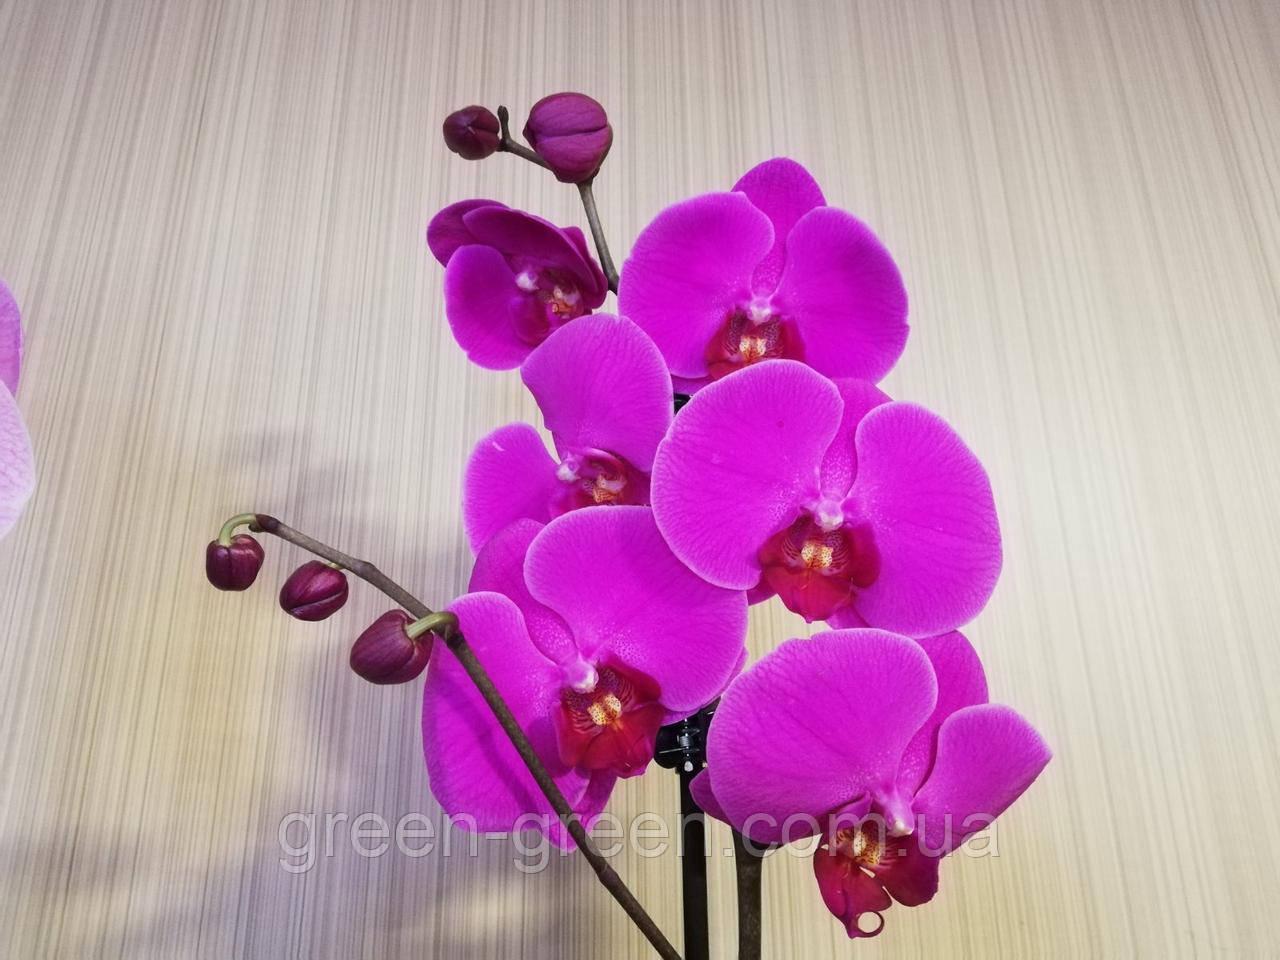 Орхидея Фаленопсис сиреневая  (не цветущая)